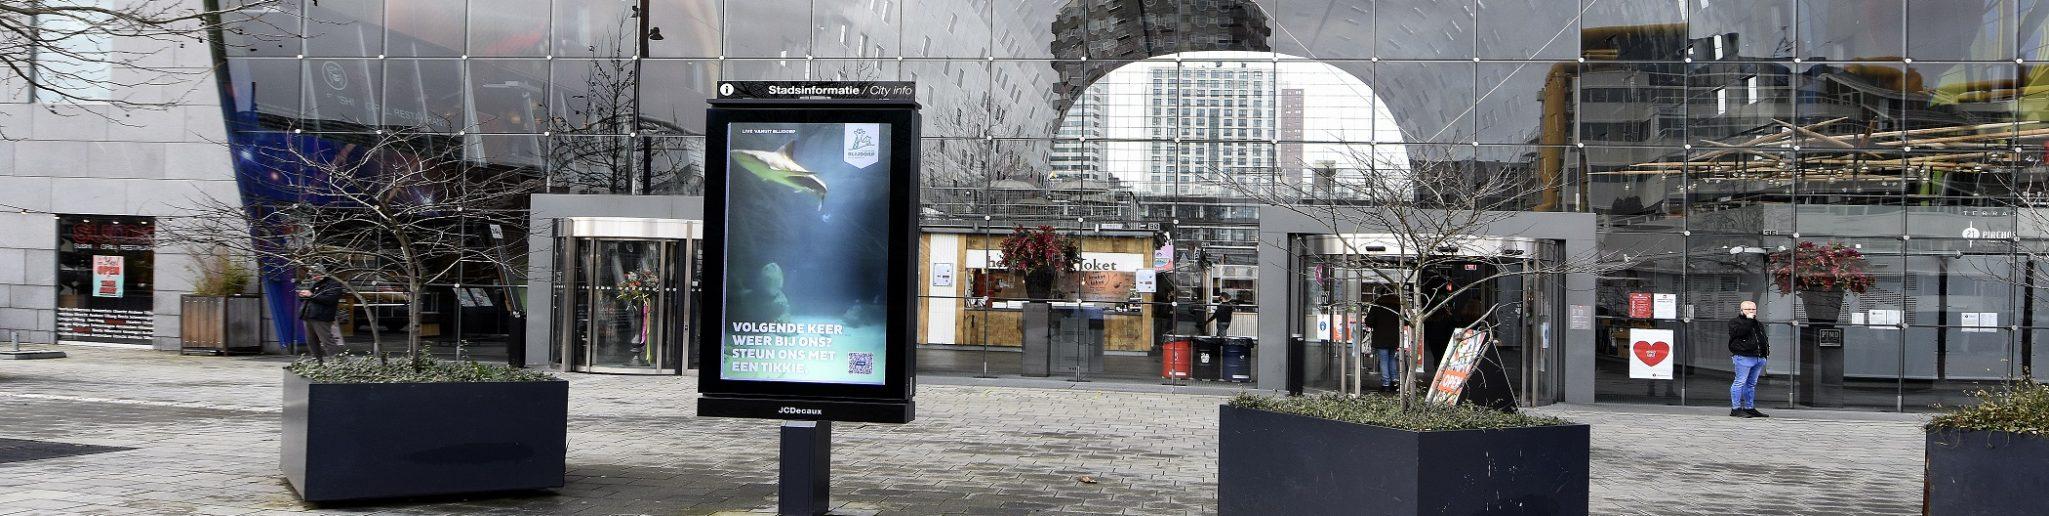 webcam haaienbassin bij markthal rotterdam